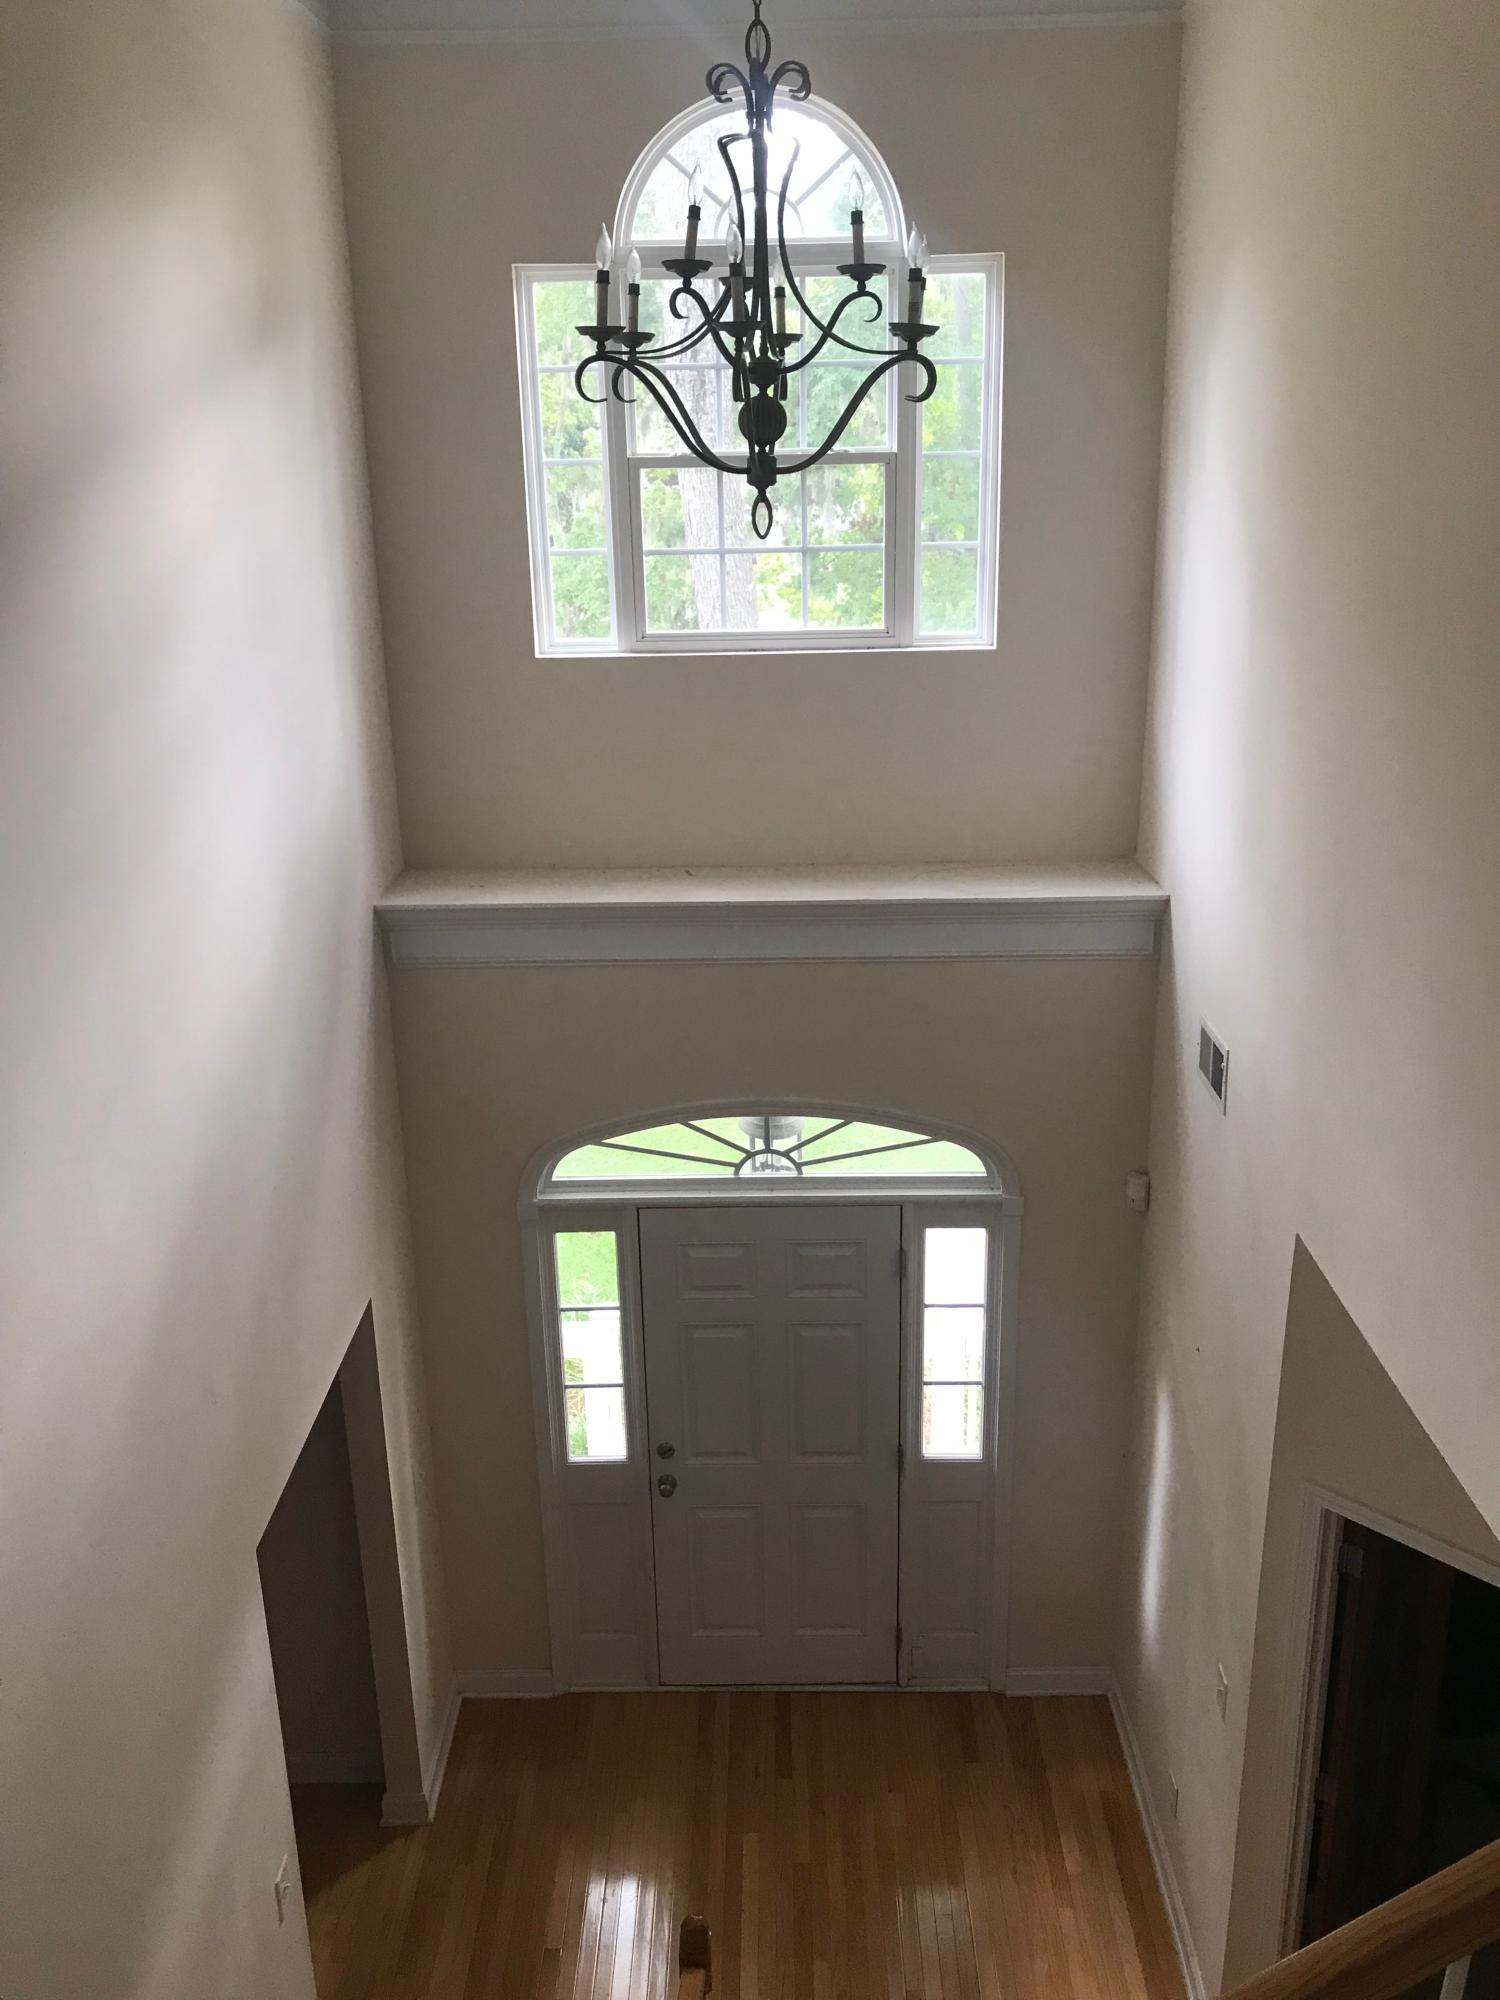 Hunt Club Phase II Homes For Sale - 1220 Walleye, Charleston, SC - 15